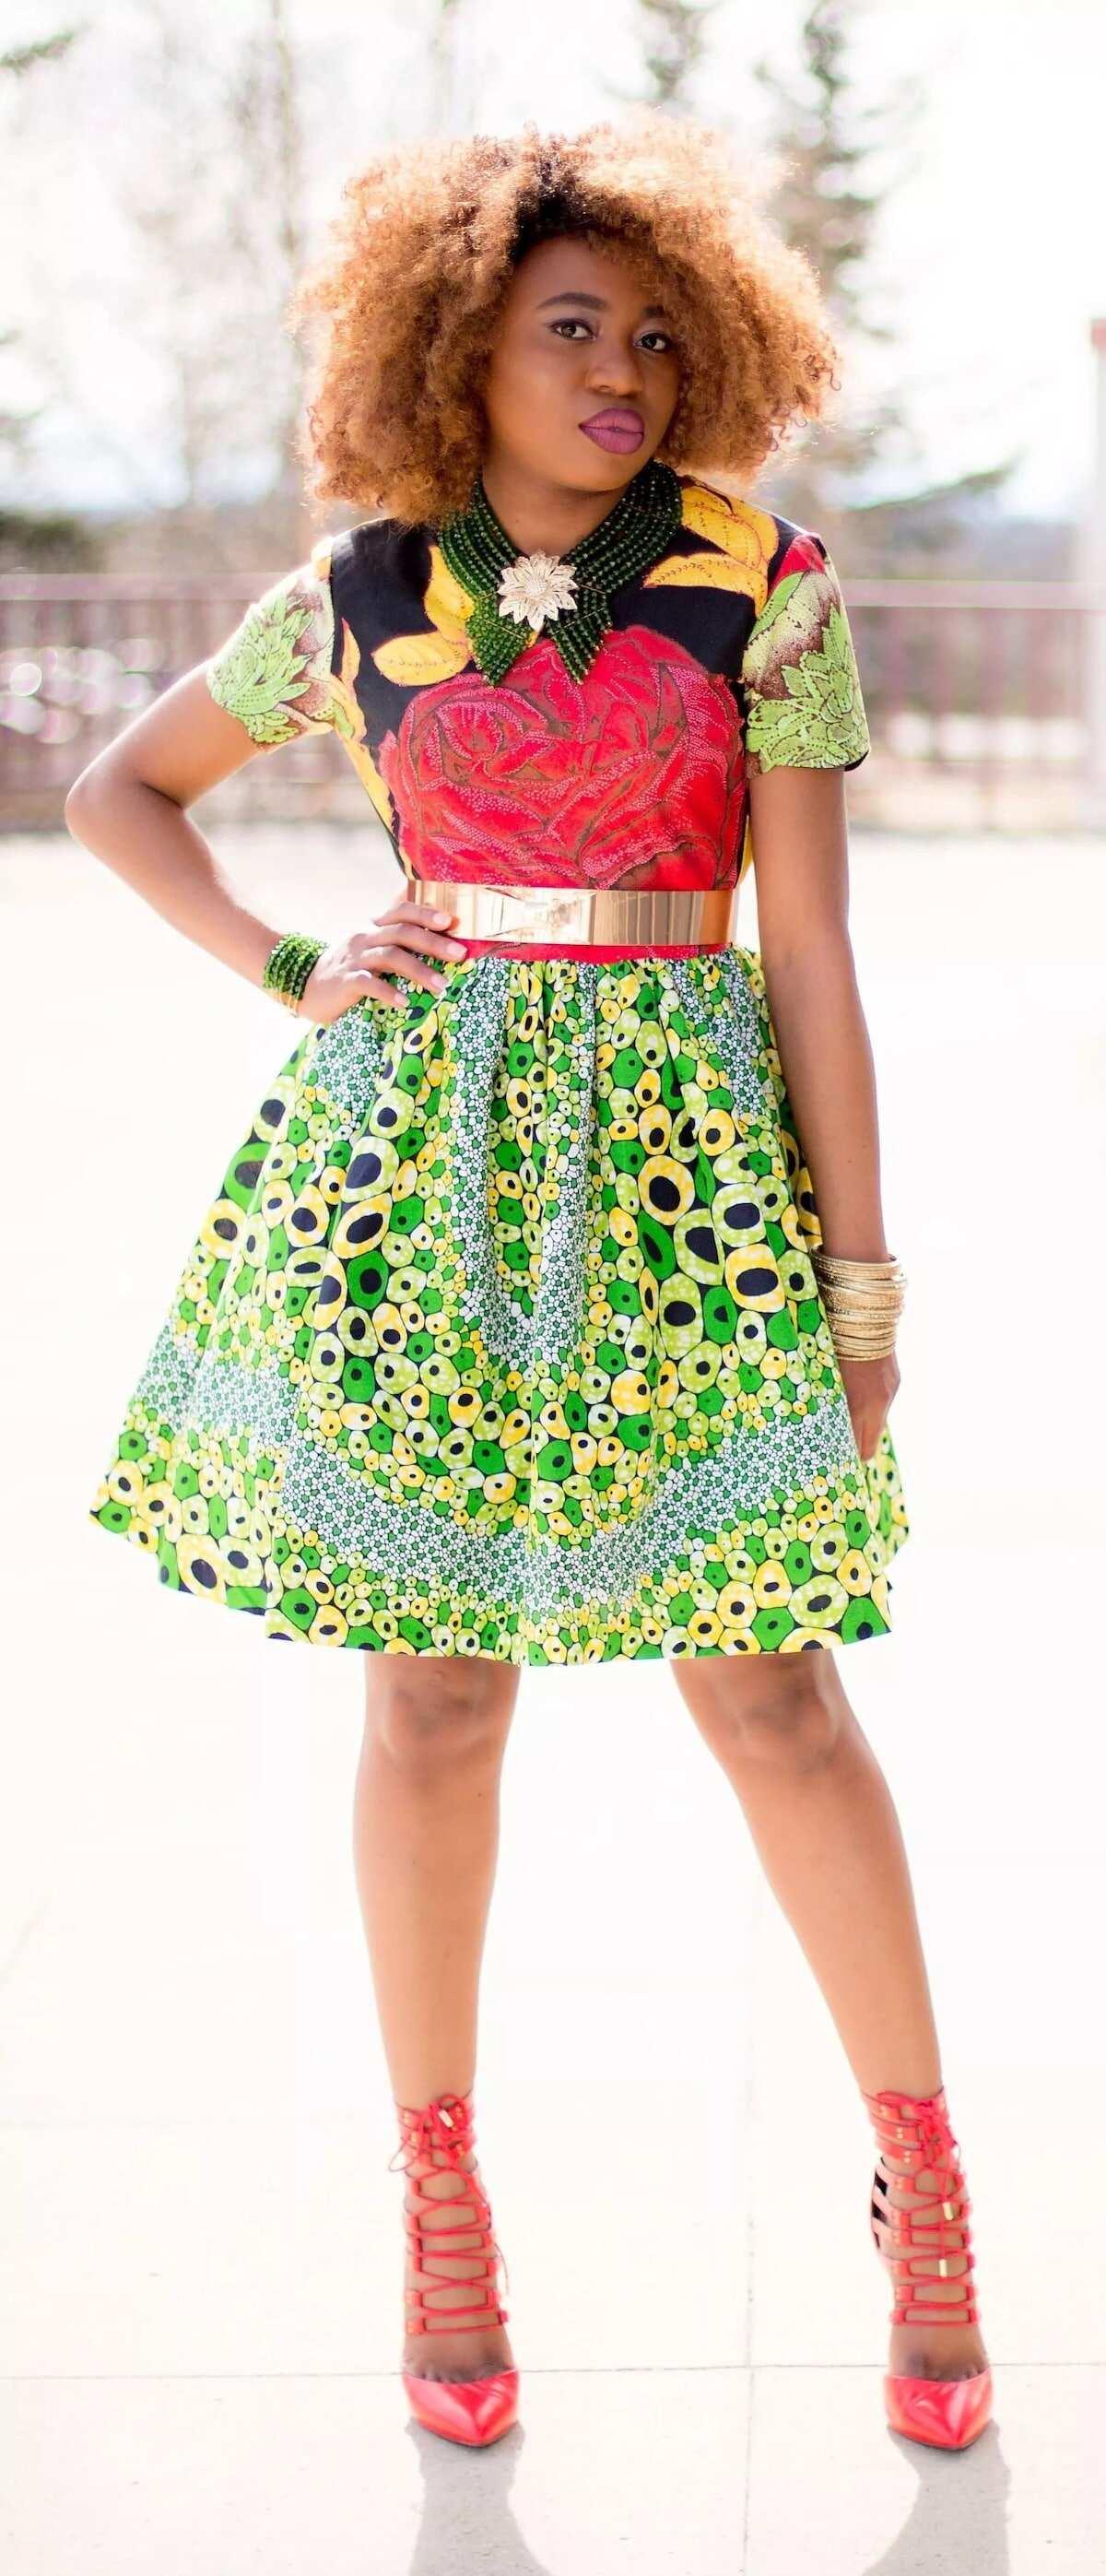 polished cotton dresses, polished cotton dress styles, polish cotton styles in ghana